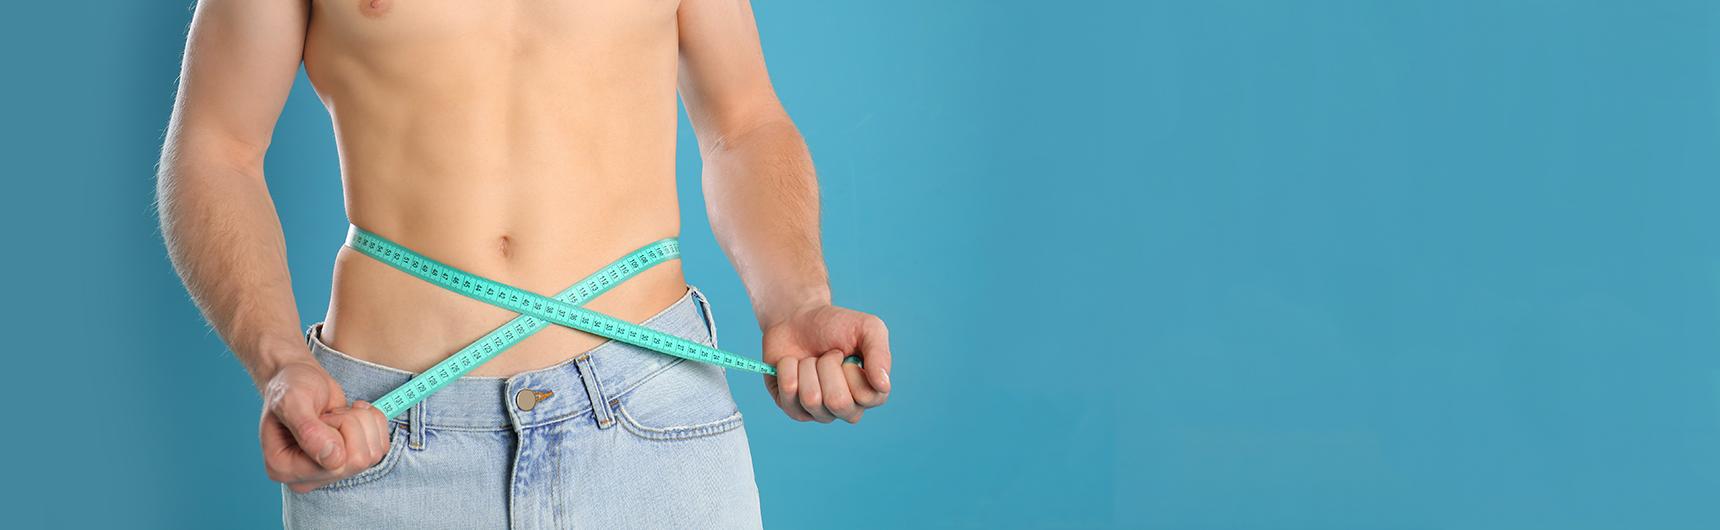 Man measuring waist size